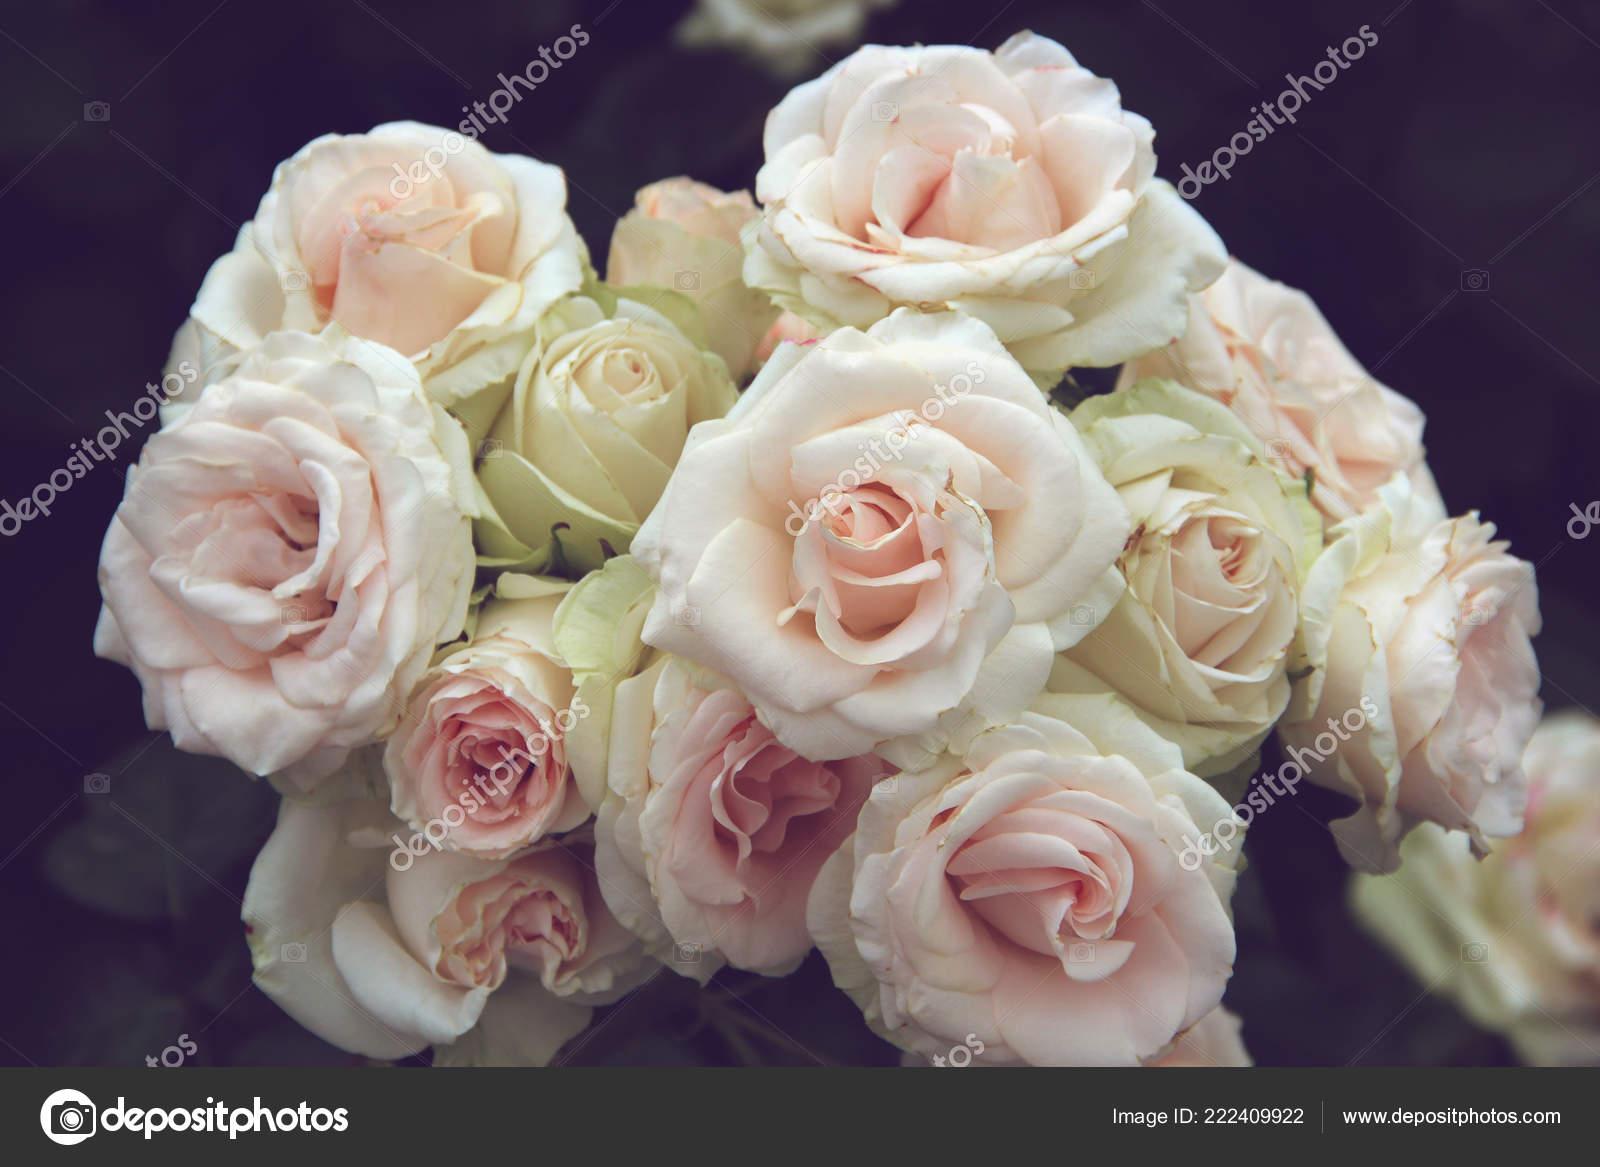 Inflorescence Light Pink Roses Bouquet Garden Flowers Dark Background Toning Stock Photo C Balagur 222409922